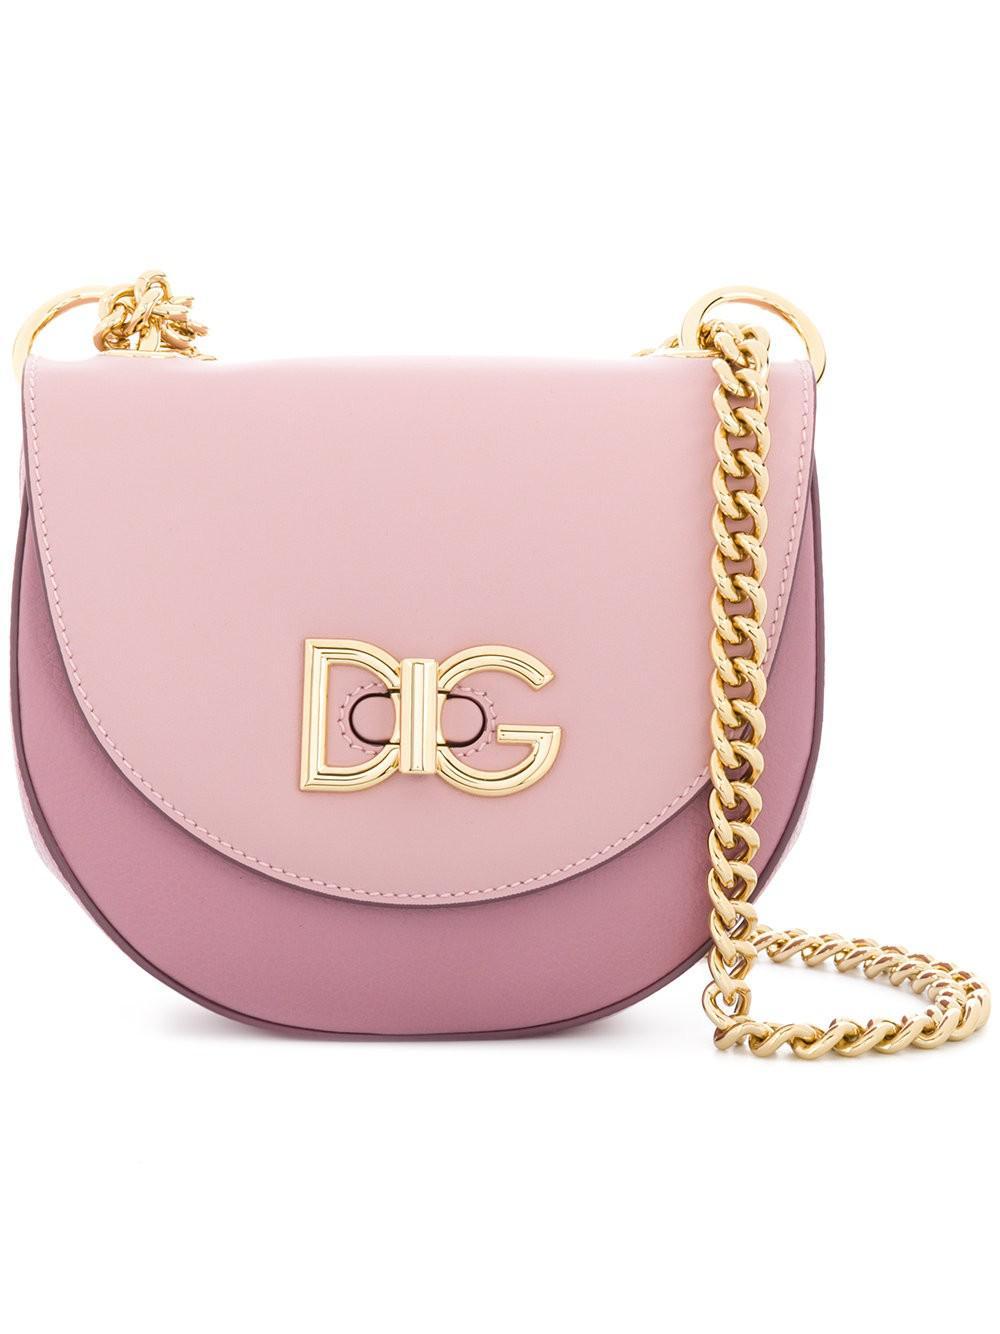 Dolce & Gabbana Sac Wifi Crossbody - Noir Vente En Gros Pas Cher Meilleur nz5S6s8v